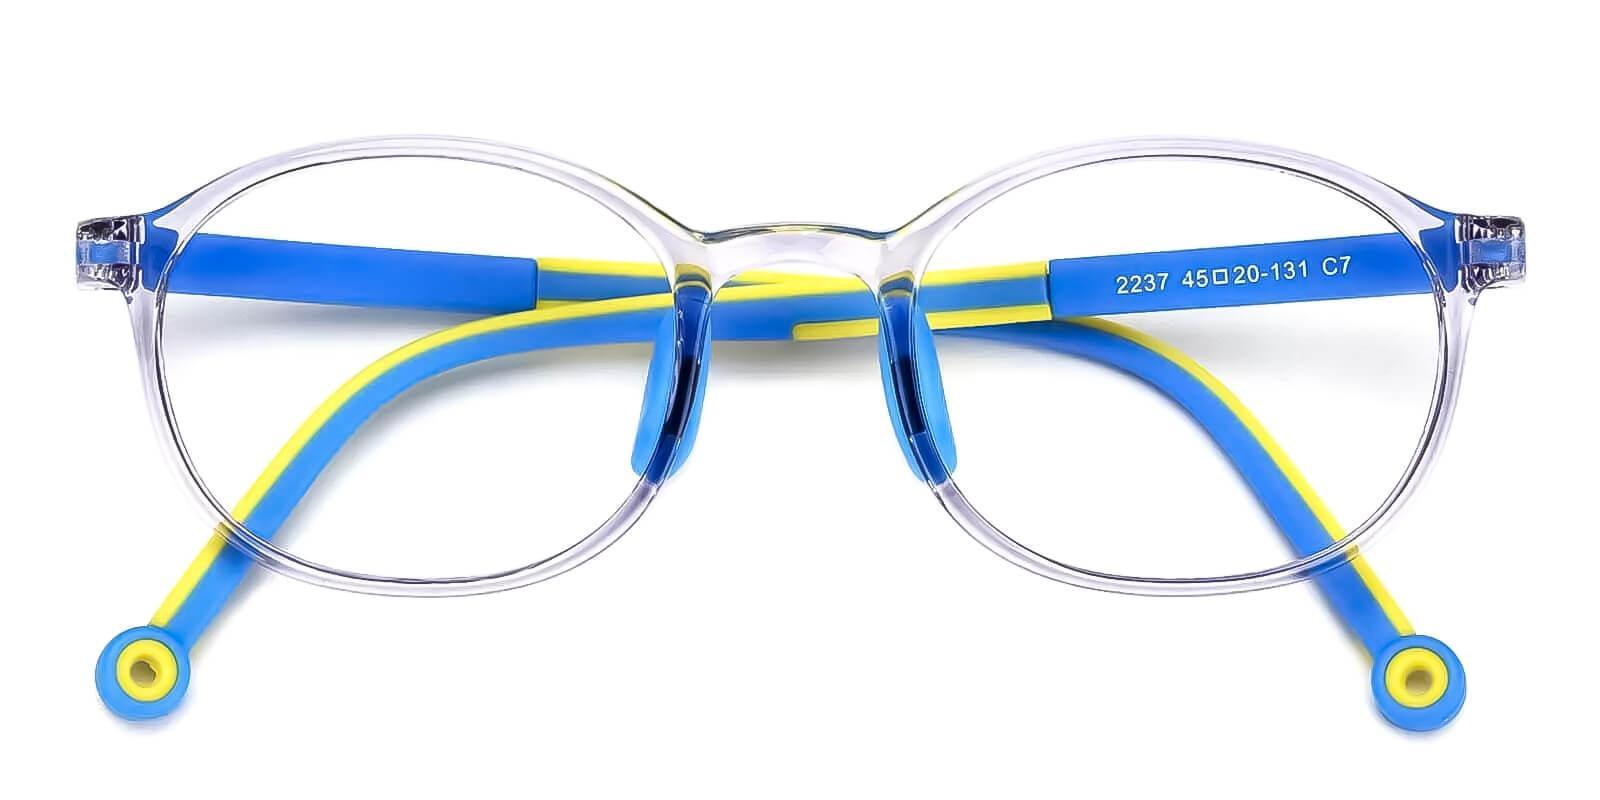 Kids-Exquisite Translucent TR Eyeglasses , Fashion , UniversalBridgeFit Frames from ABBE Glasses